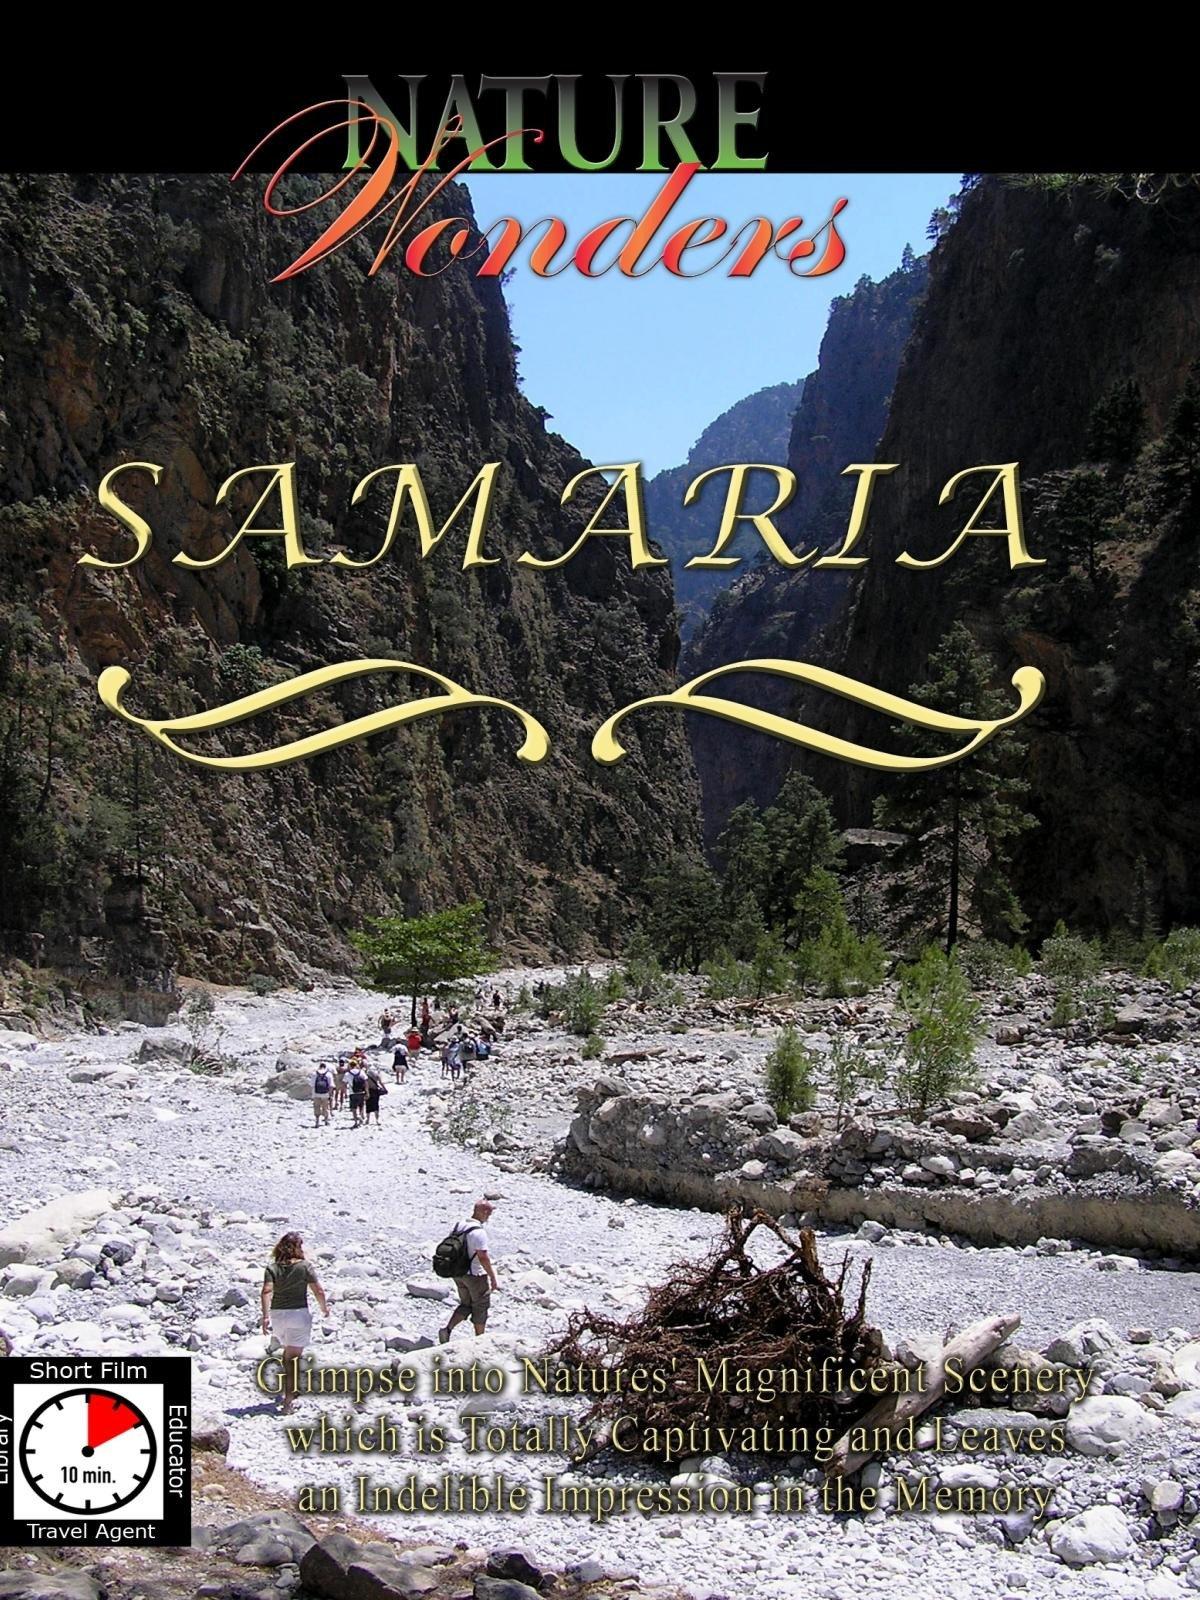 Nature Wonders - Samaria - Kreta - Crete, Greece